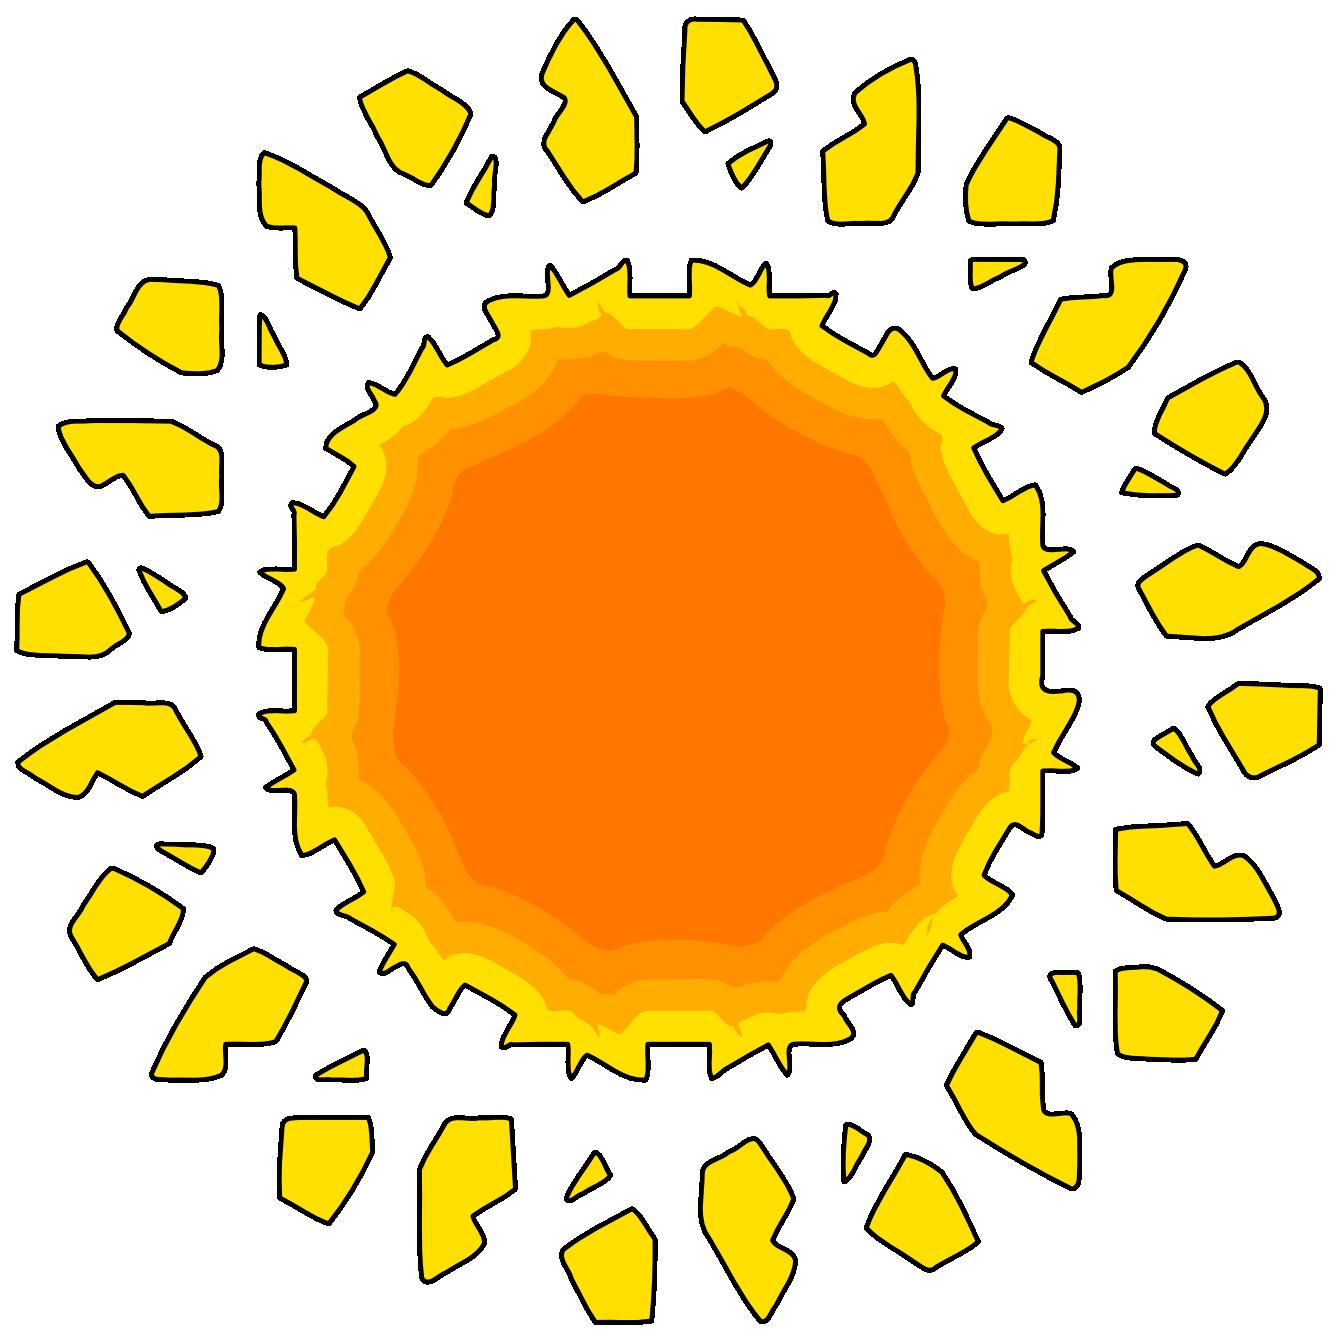 Sun clipart public domain jpg stock Sunshine Free Sun Clipart Public Domain Sun Clip Art Images And 8 jpg stock